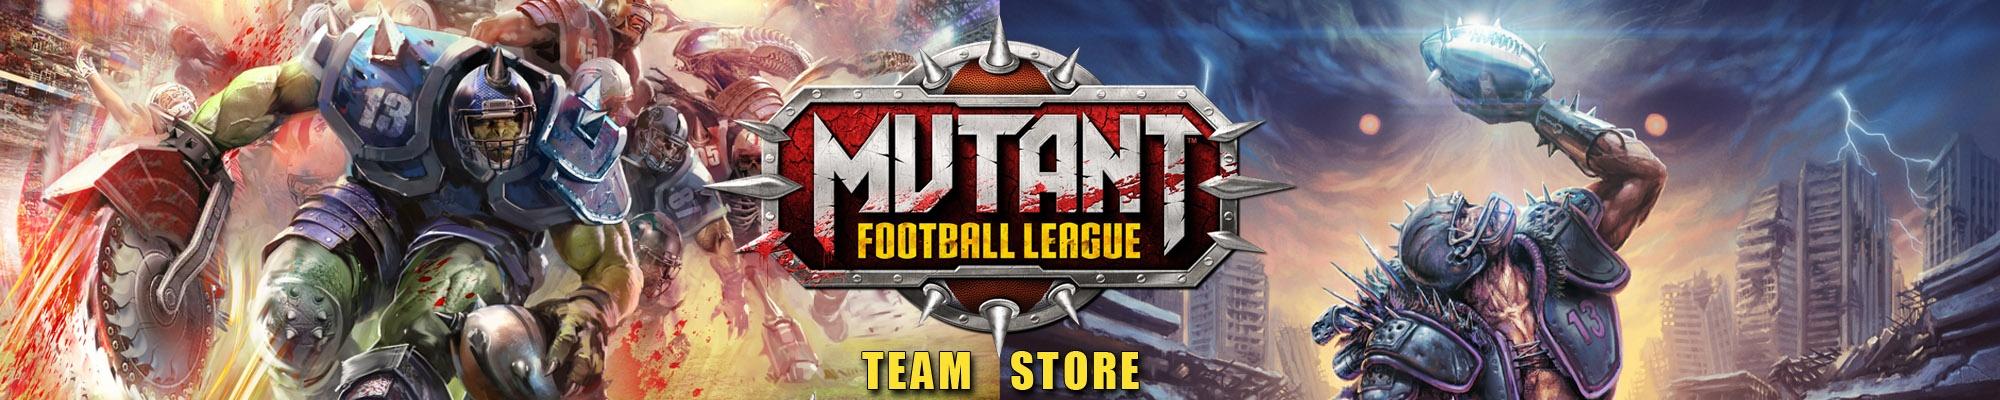 mutantfootball Cover